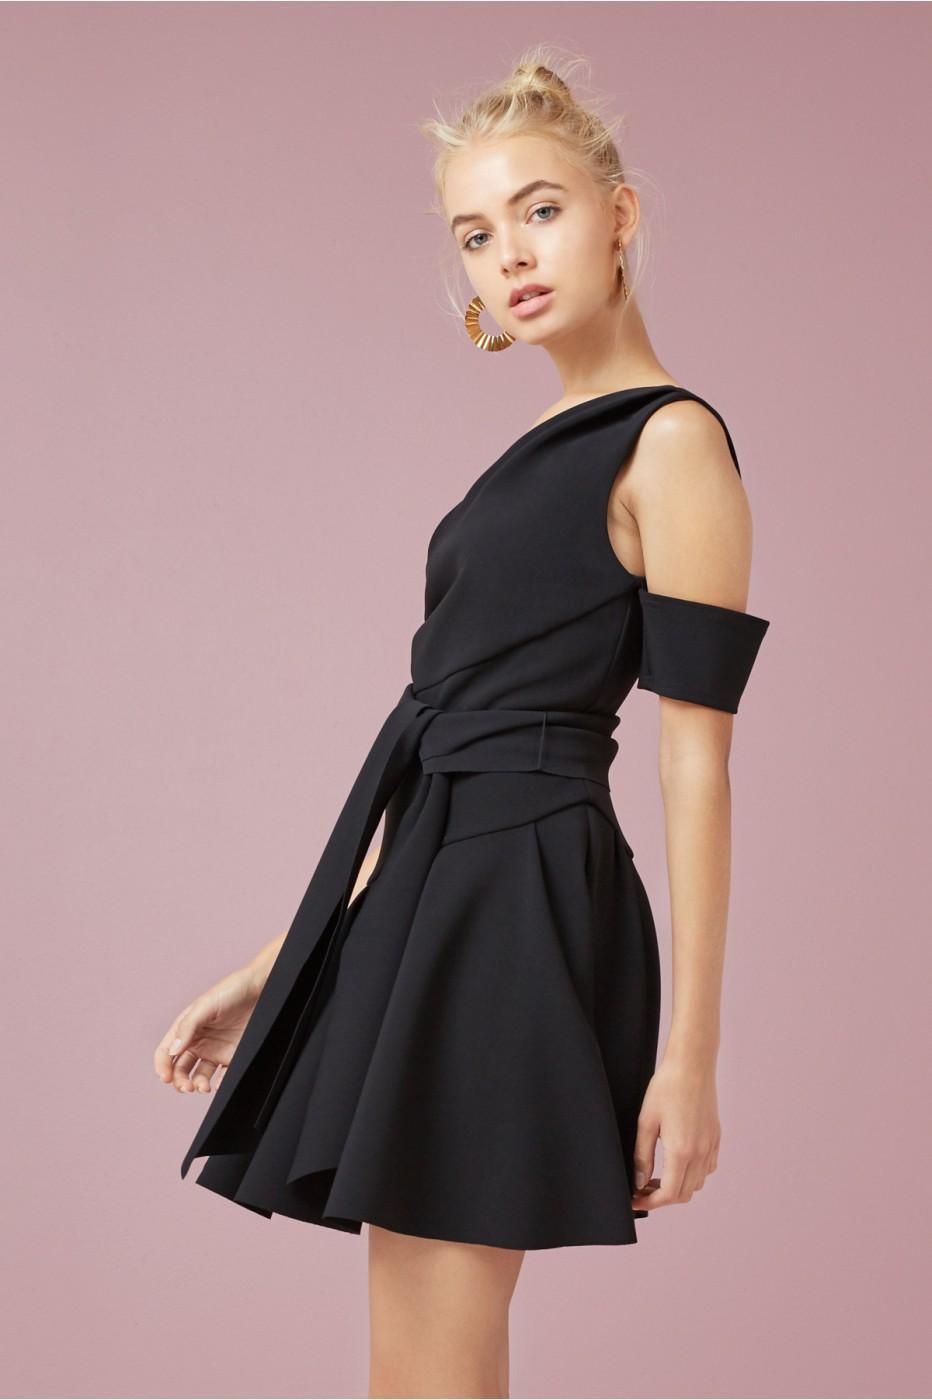 Finders Keepers Oblivion Mini Dress In Black